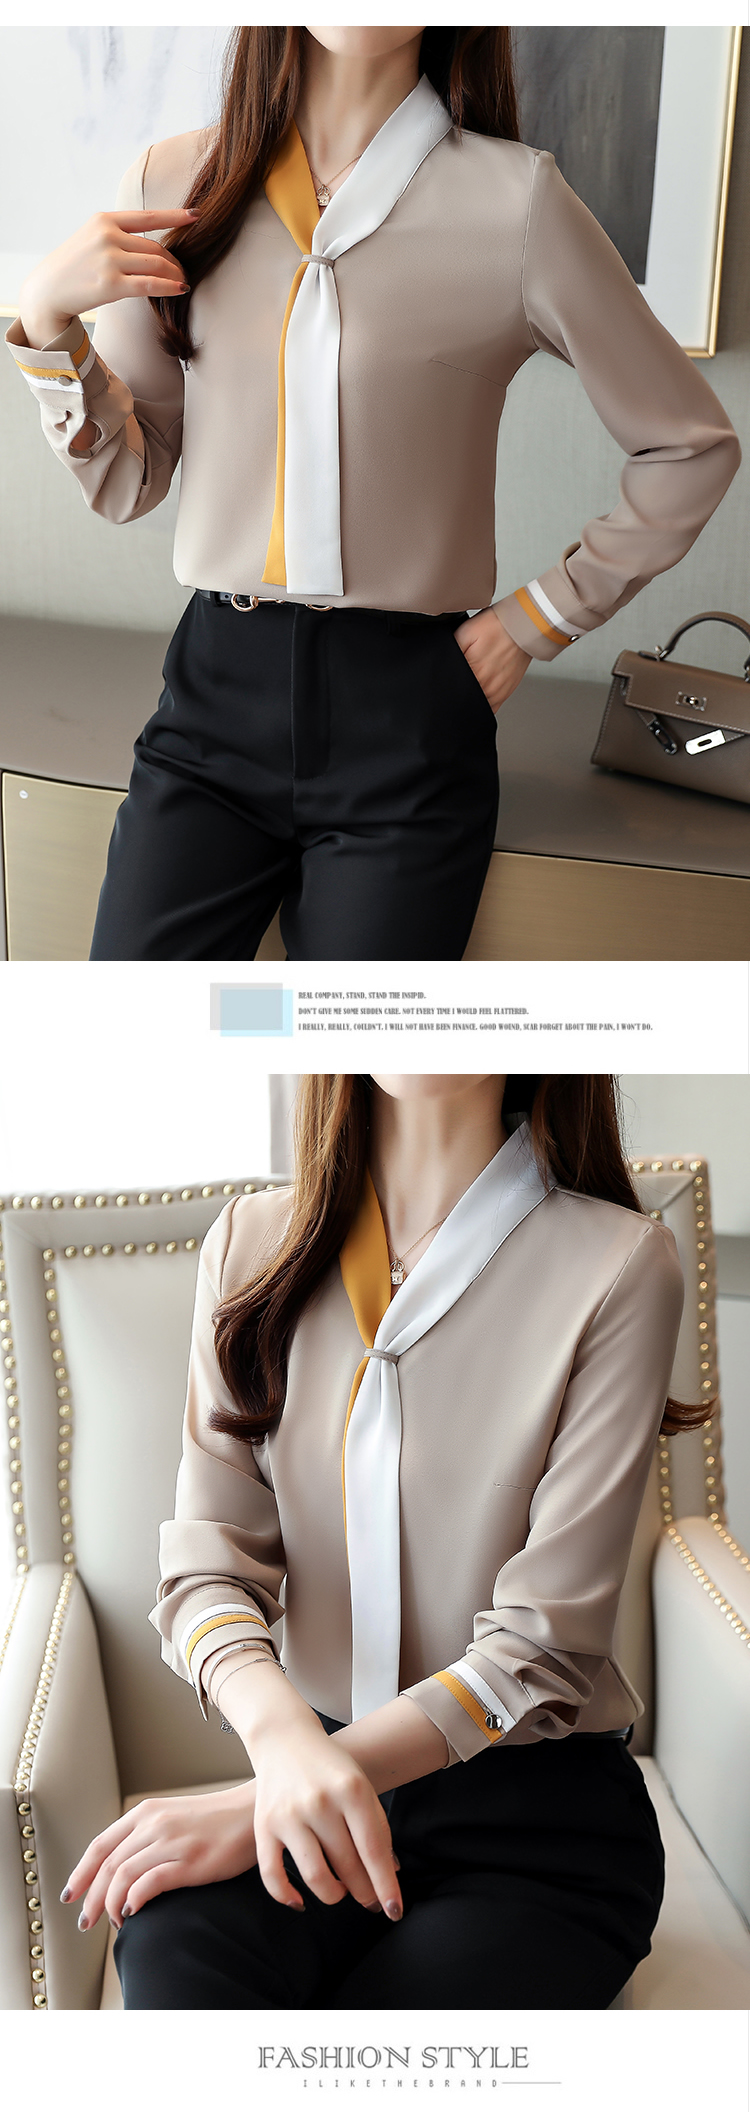 chiffon, moda de 2019, outono blusas,